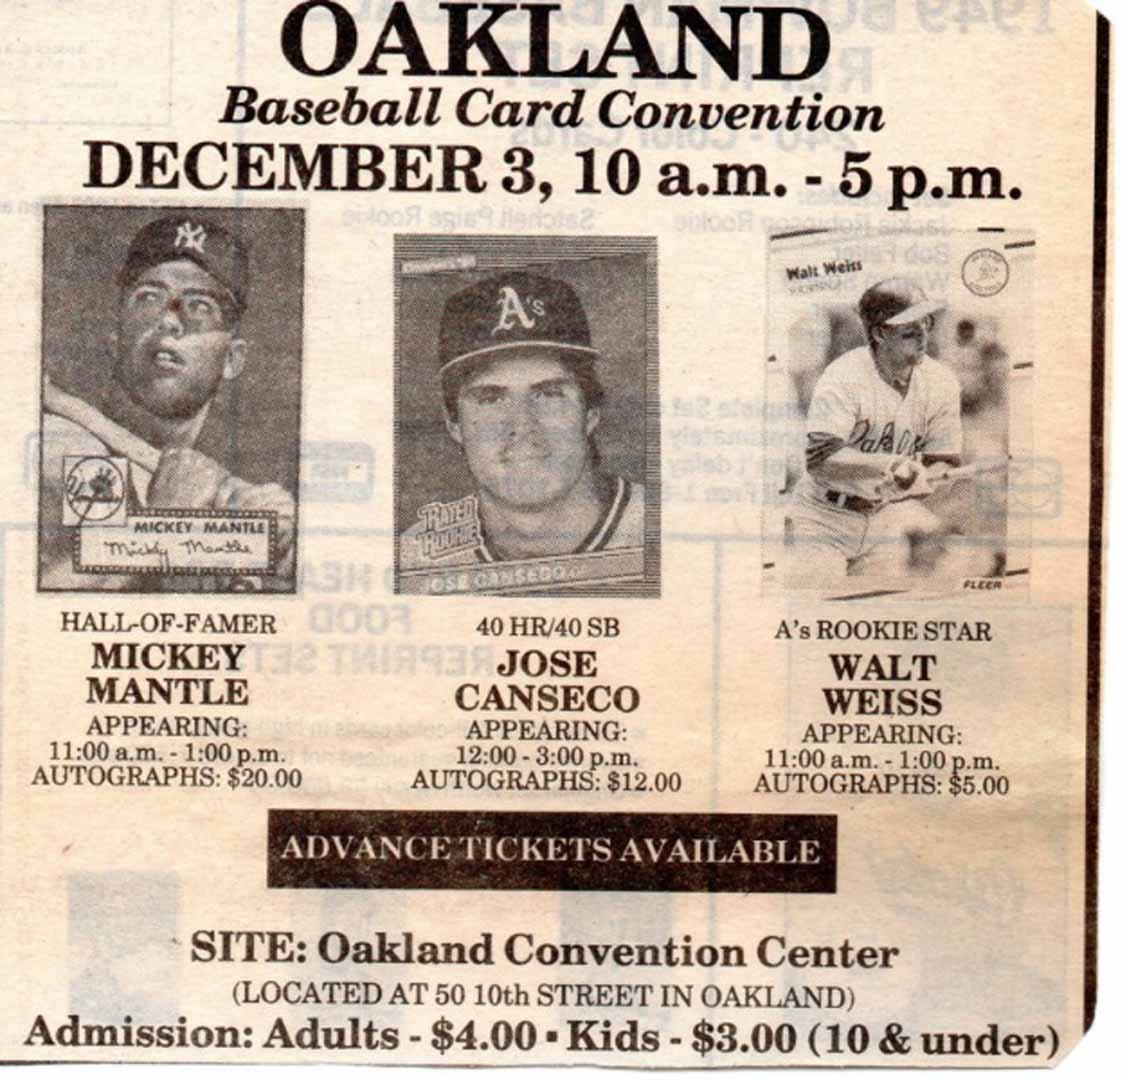 1988 baseball card news 11/25